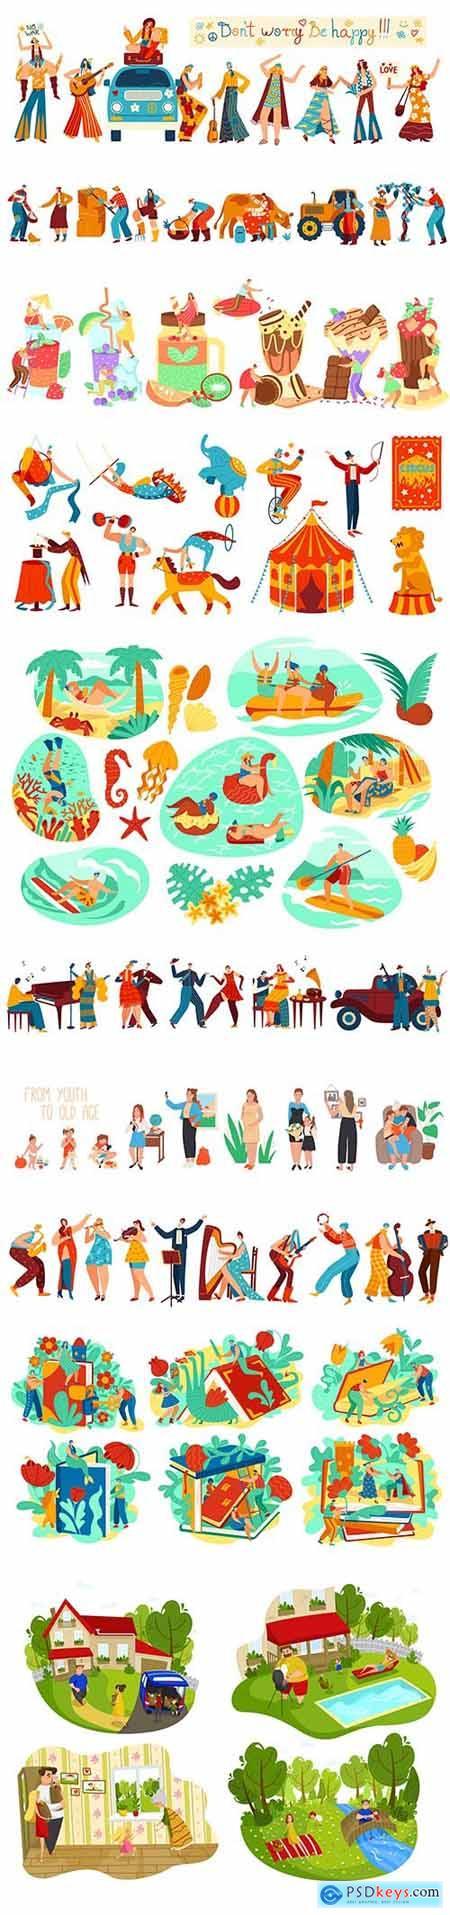 Flat Illustration Happy People Activities Vol 2